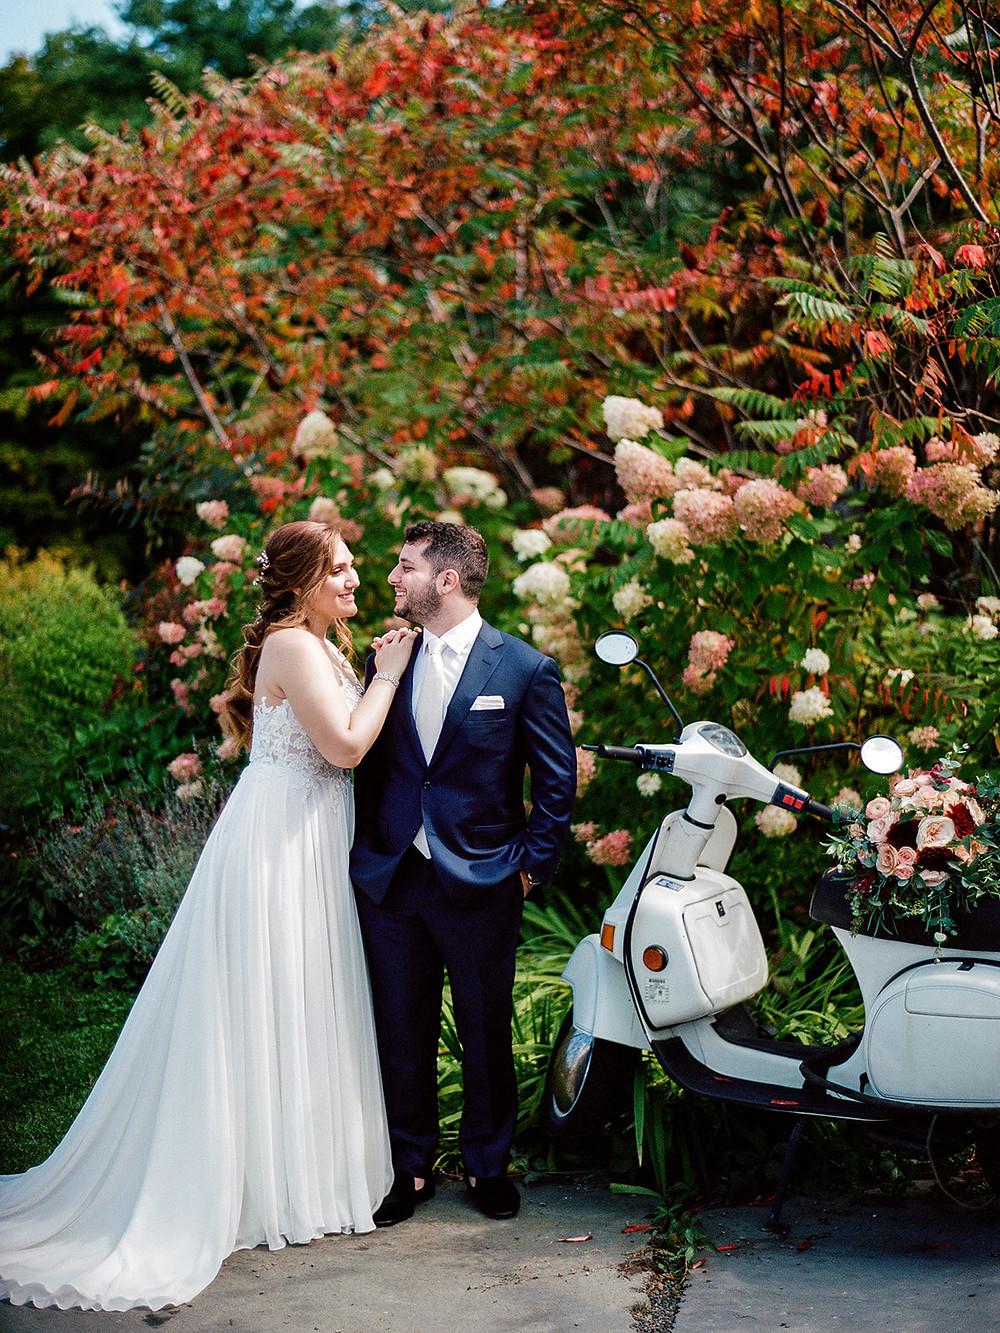 Jessica Manns Photography Wedding Portrait: Vintage Glam Barn Wedding at The Treman Center